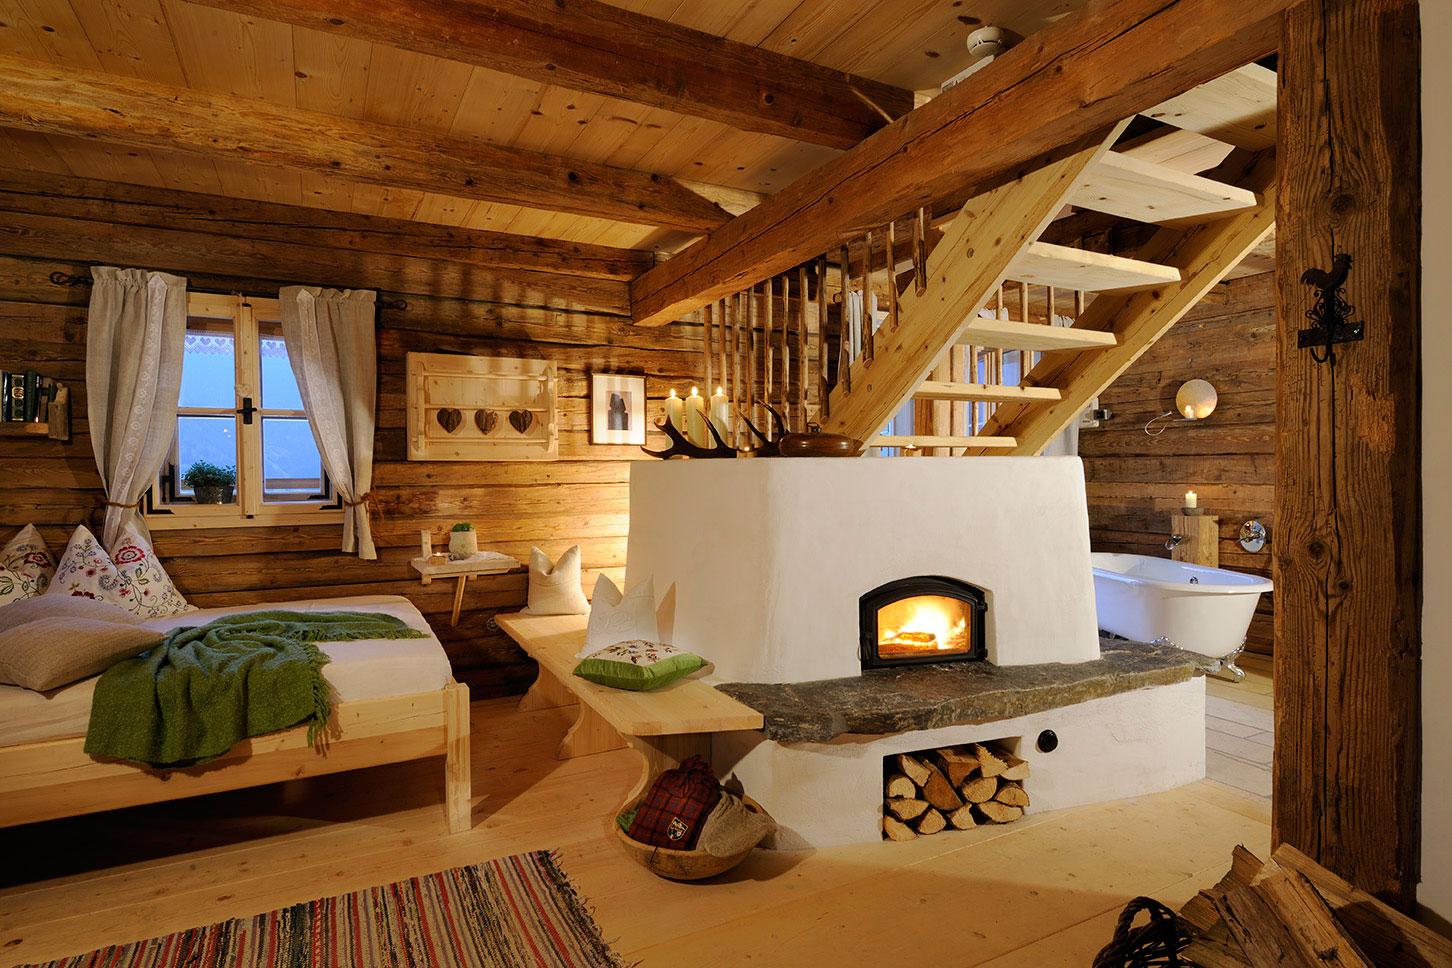 uriges wohnzimmer:Barn Style Home Interiors